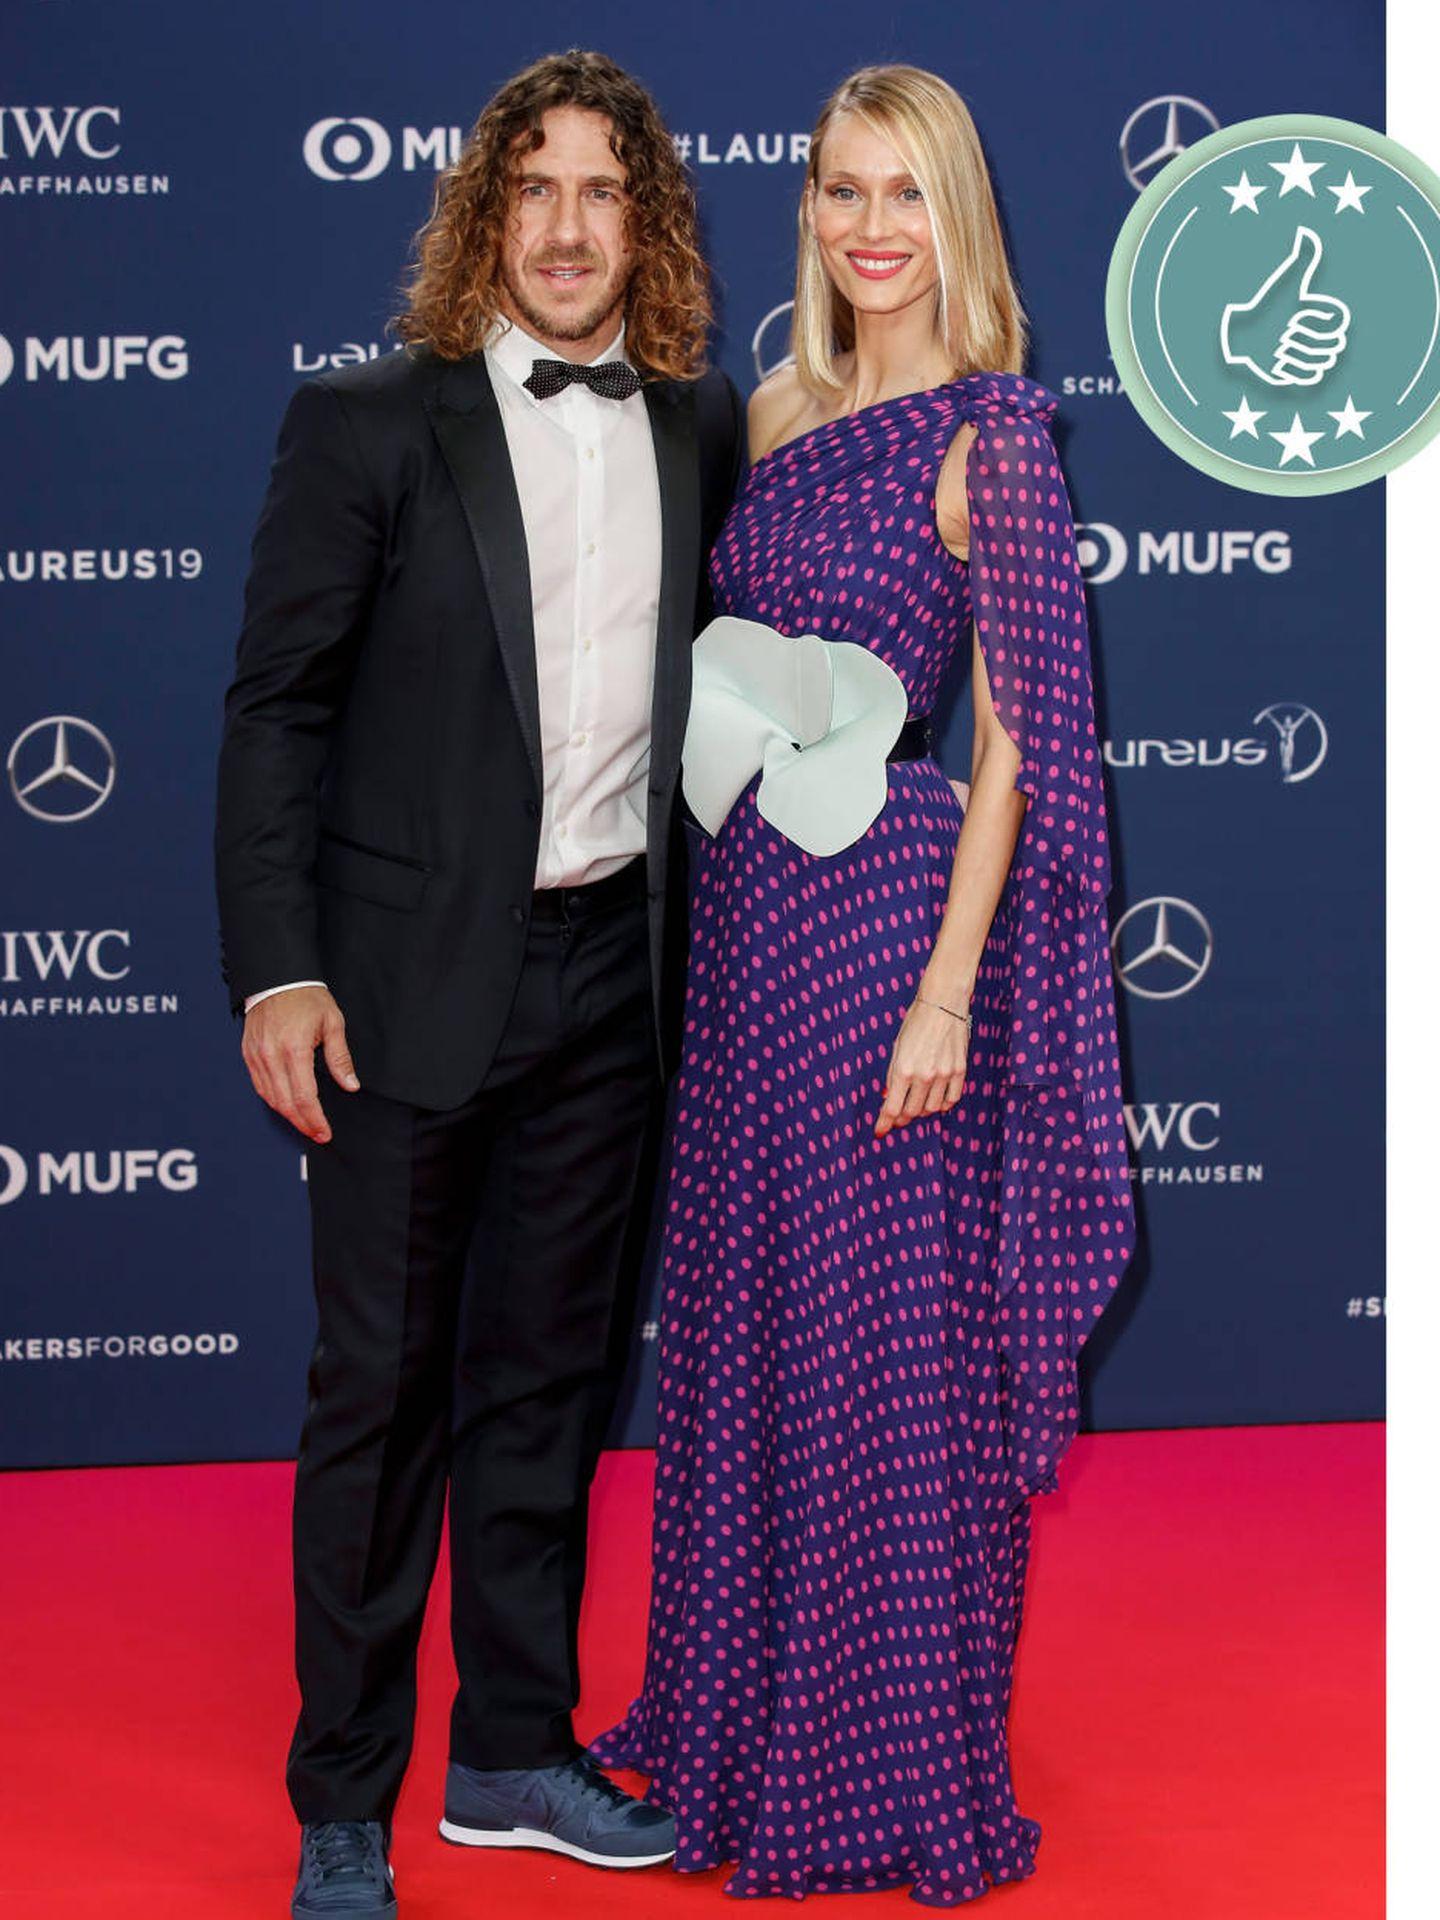 Carles Puyol y Vanesa Lorenzo. (Cordon Press)